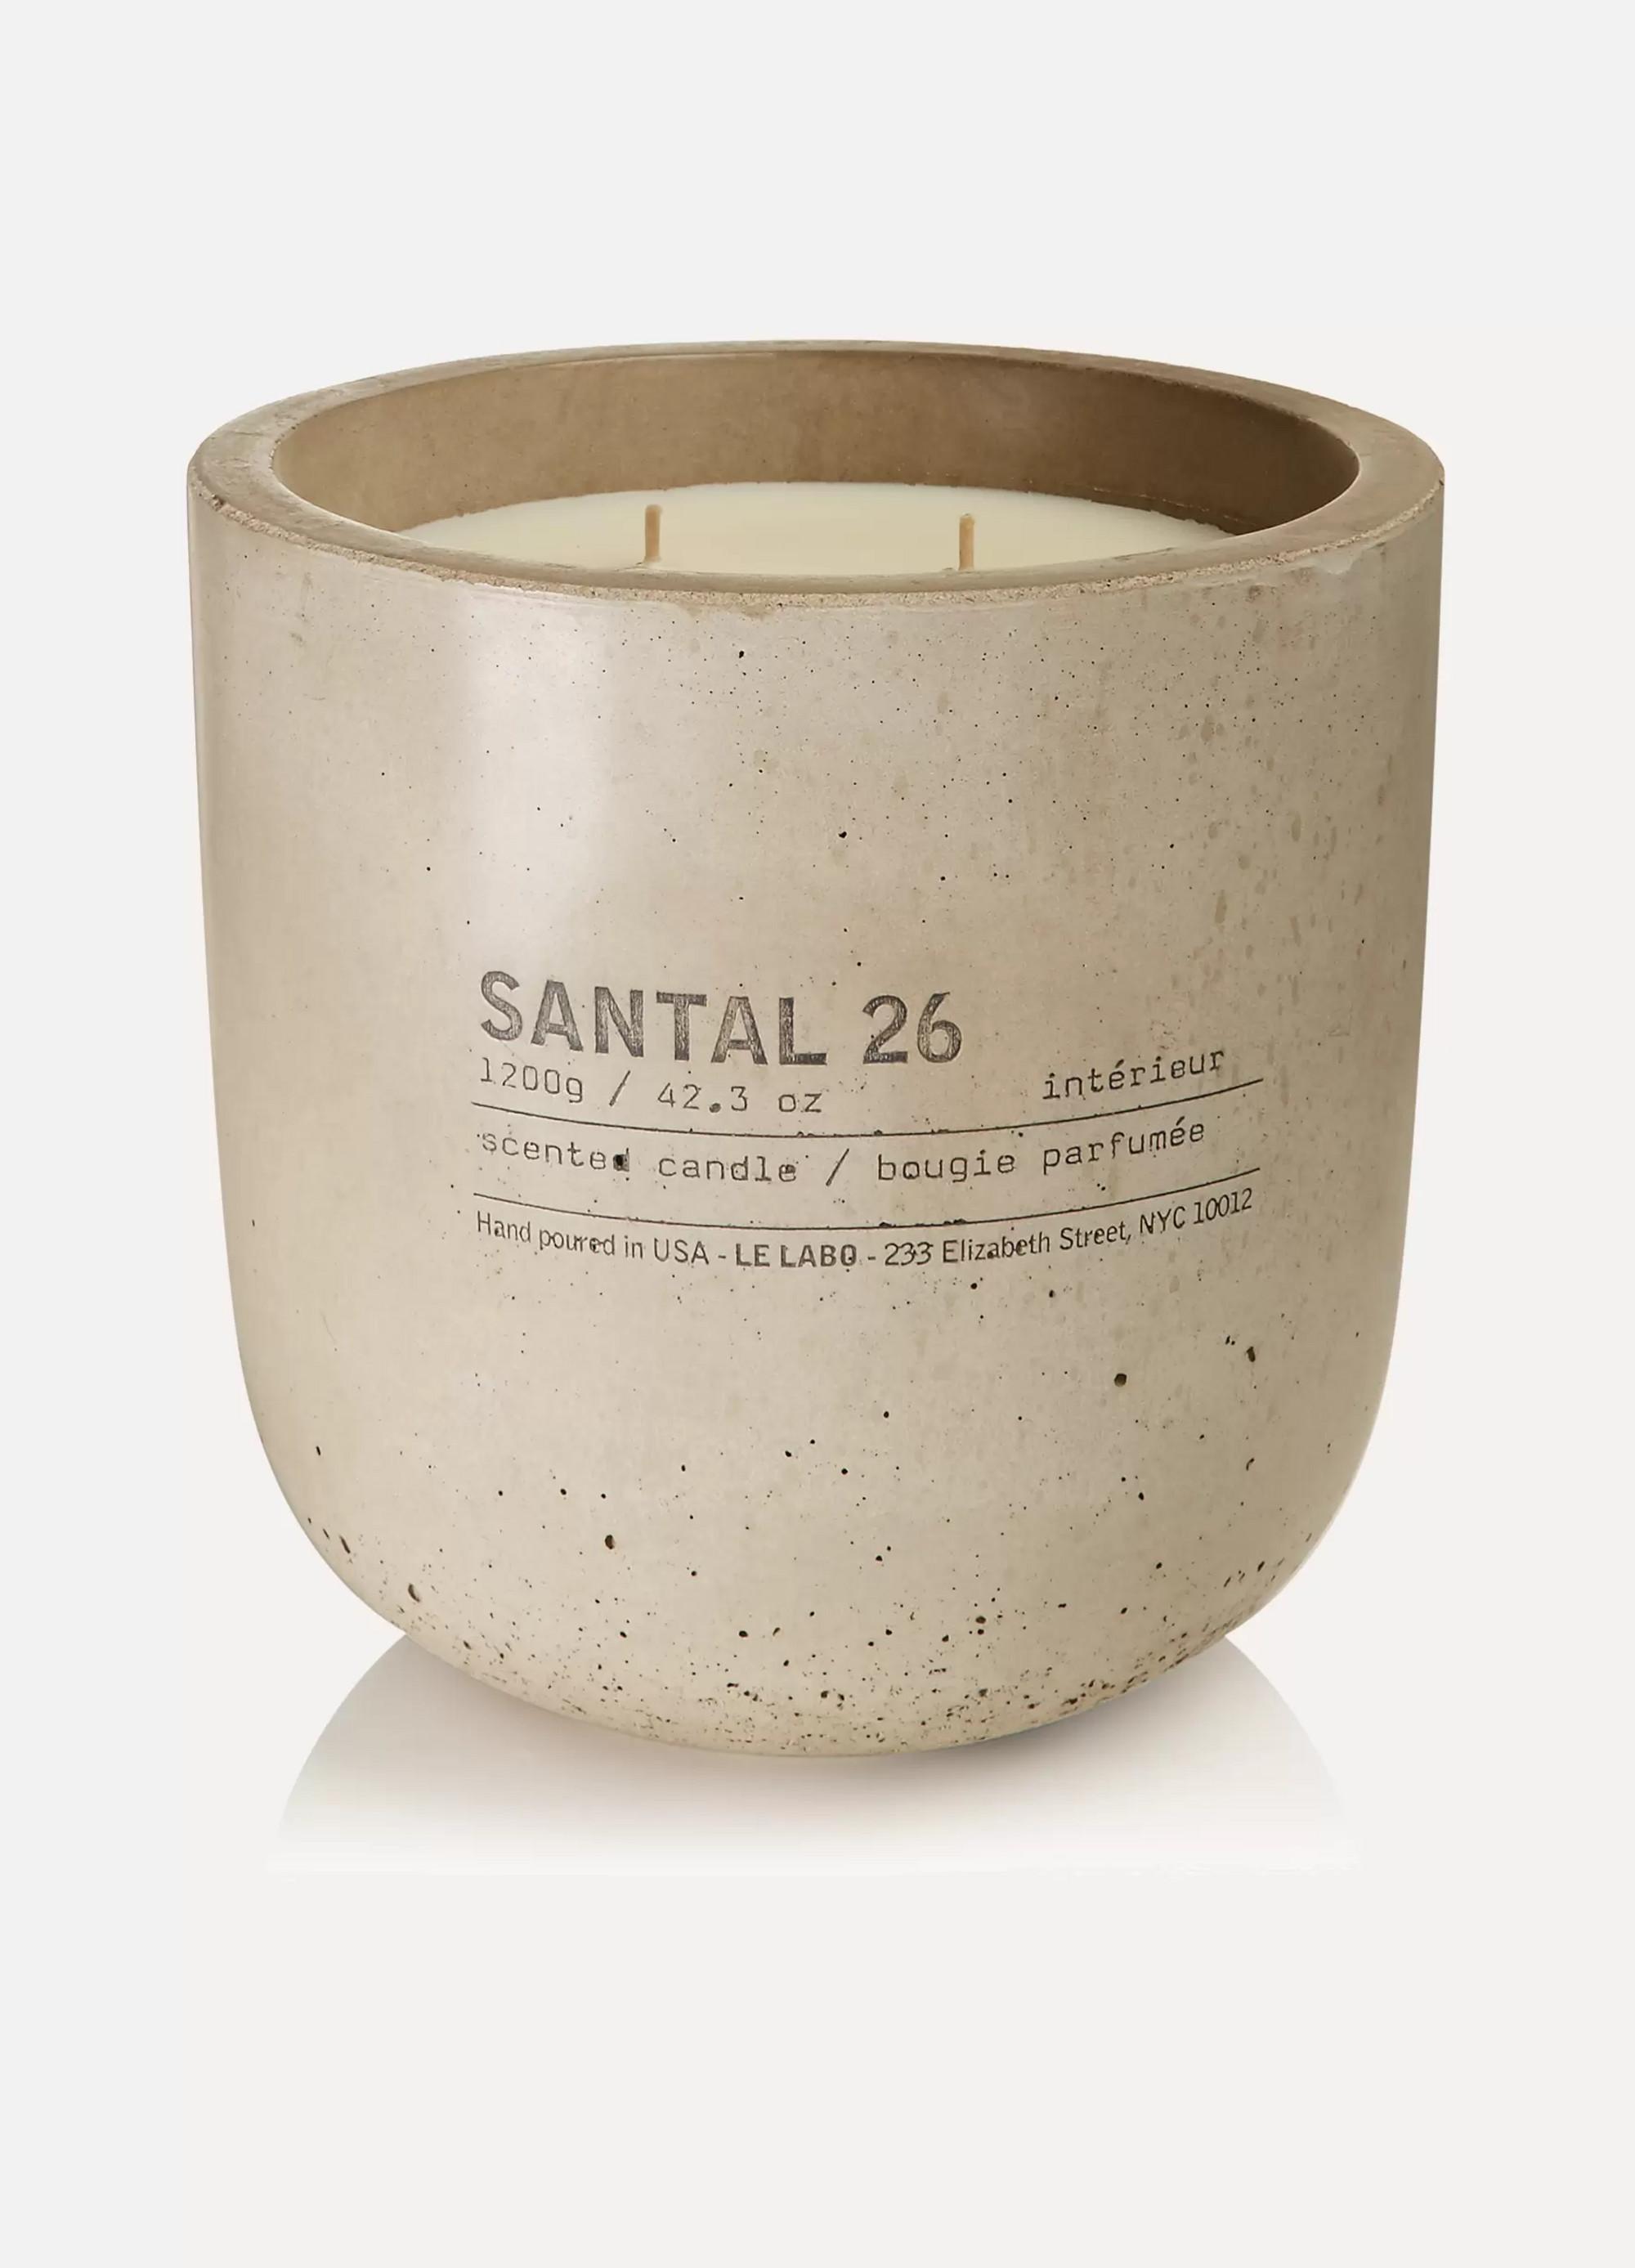 Le Labo Santal 26 scented candle, 1.2kg